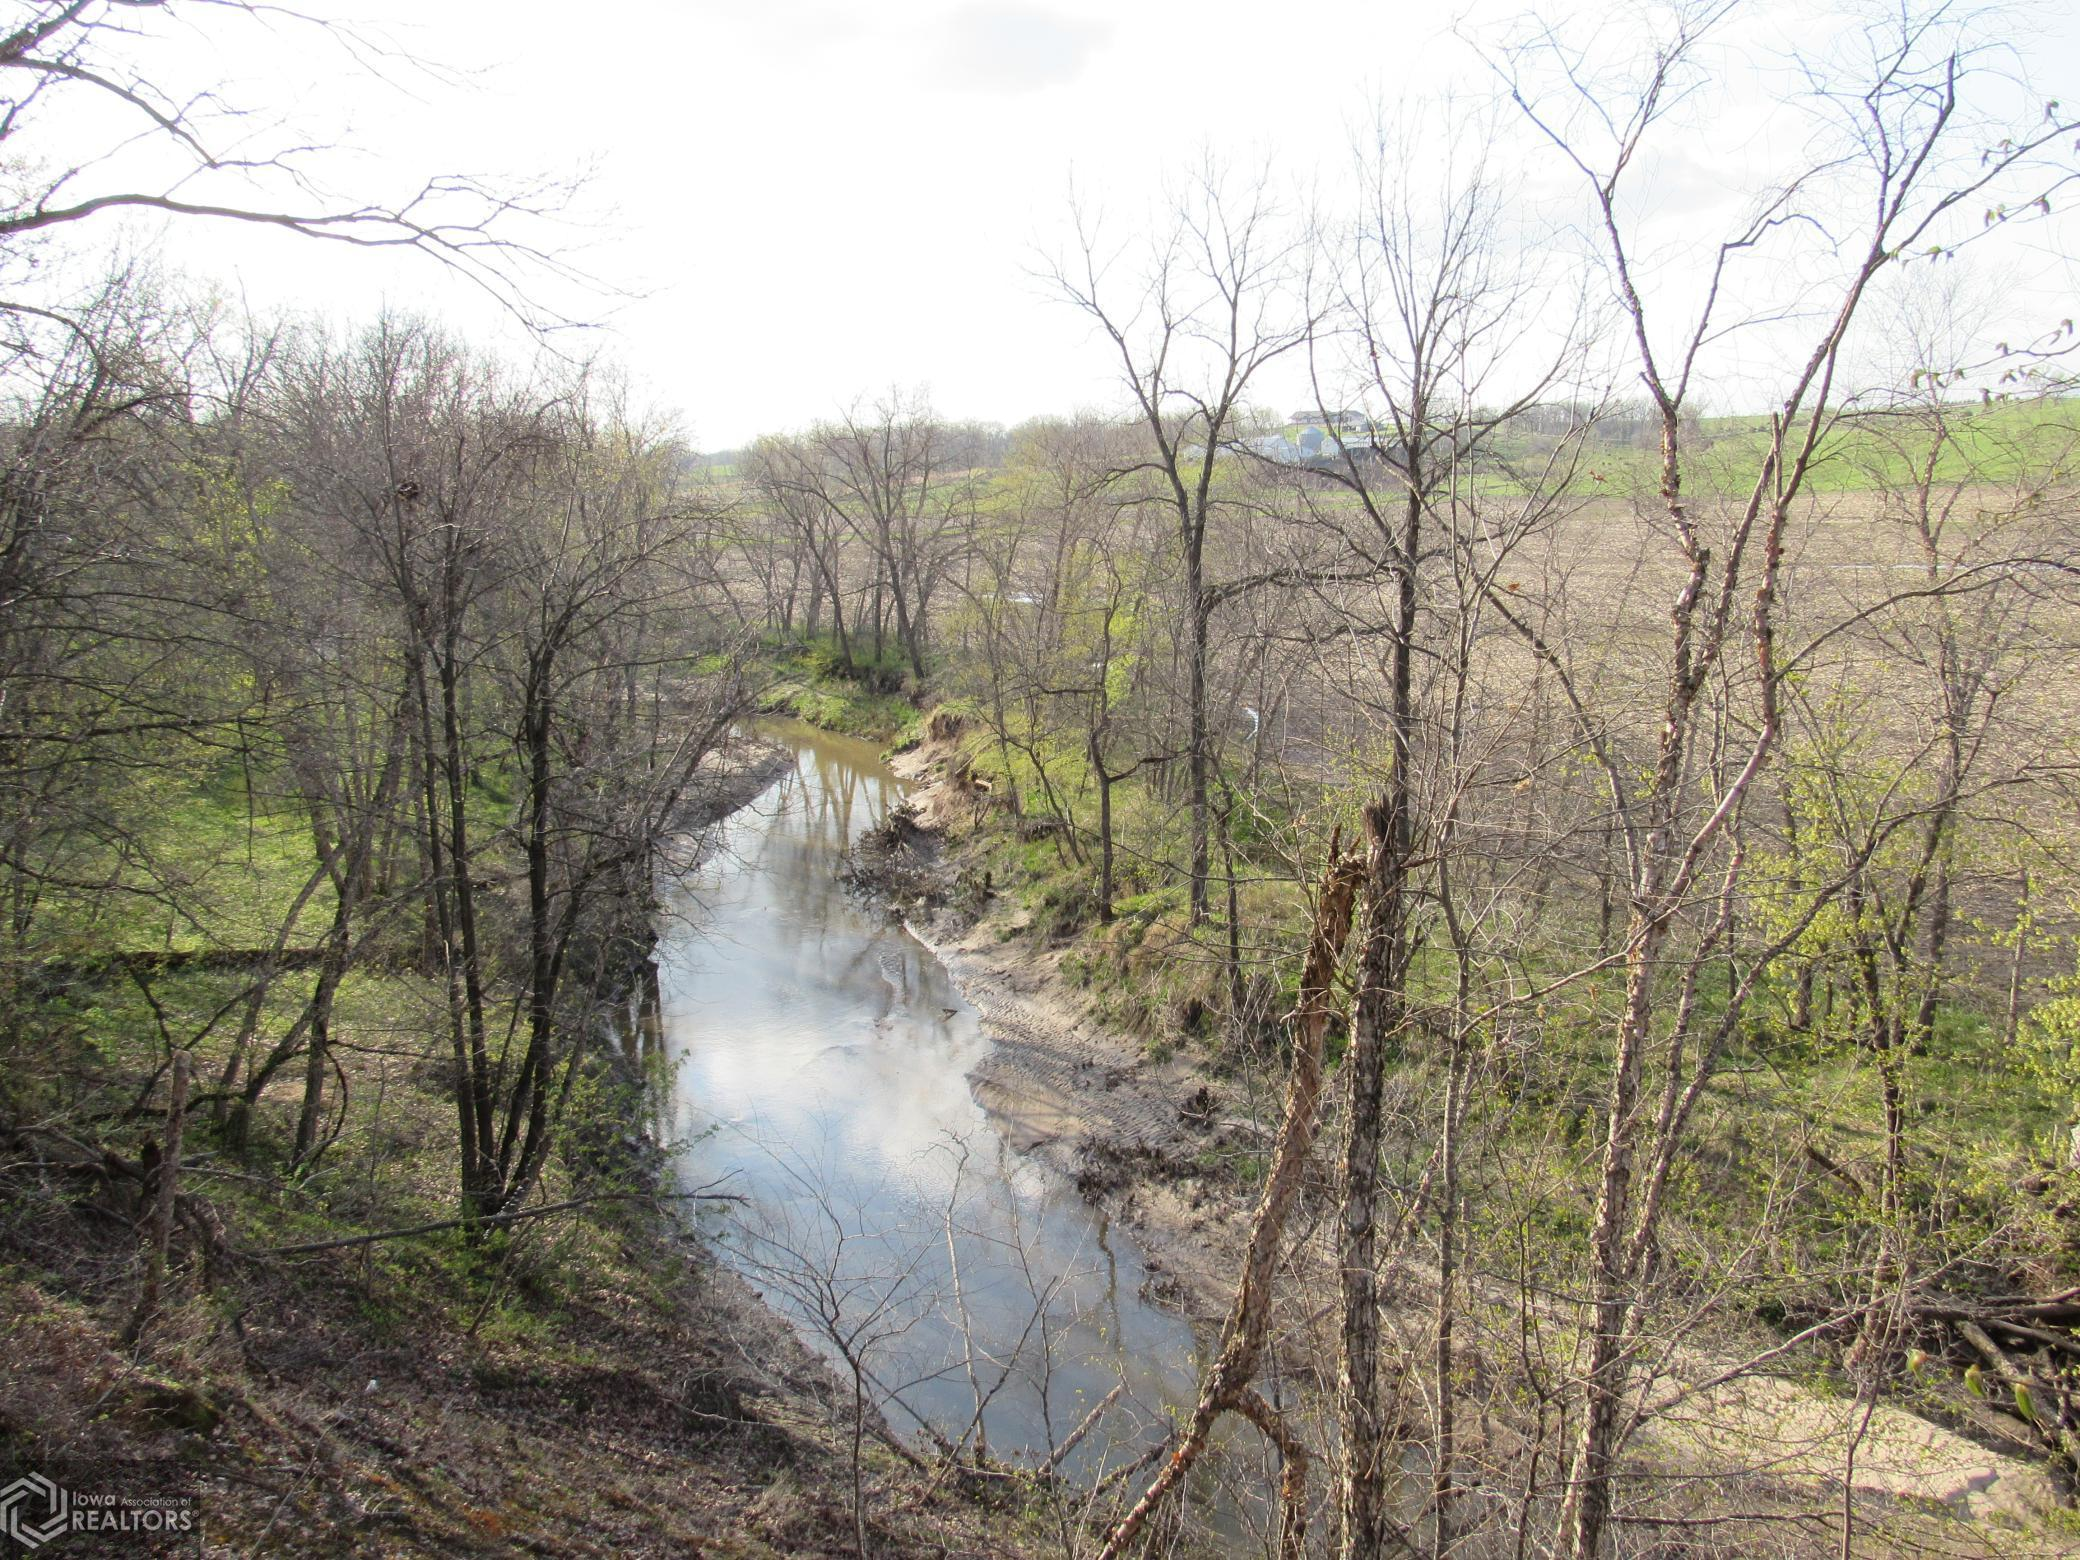 18575 Virga, Bloomfield, Iowa 52537, ,Farm,For Sale,Virga,5740825